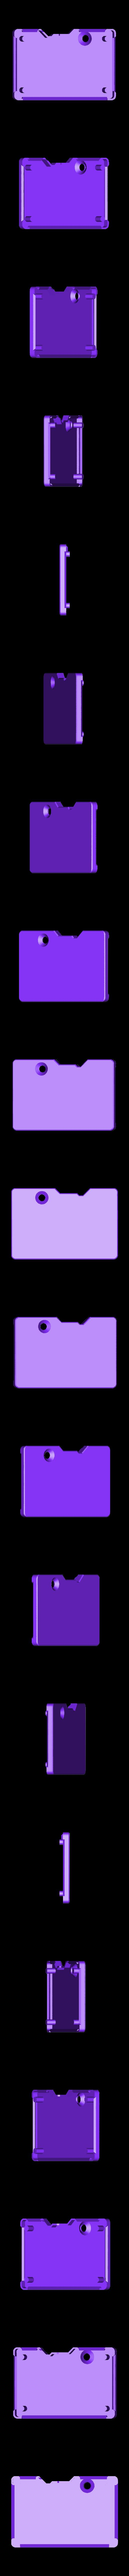 snapfit-bottom.stl Download free STL file PyBadge Case • 3D print model, Adafruit